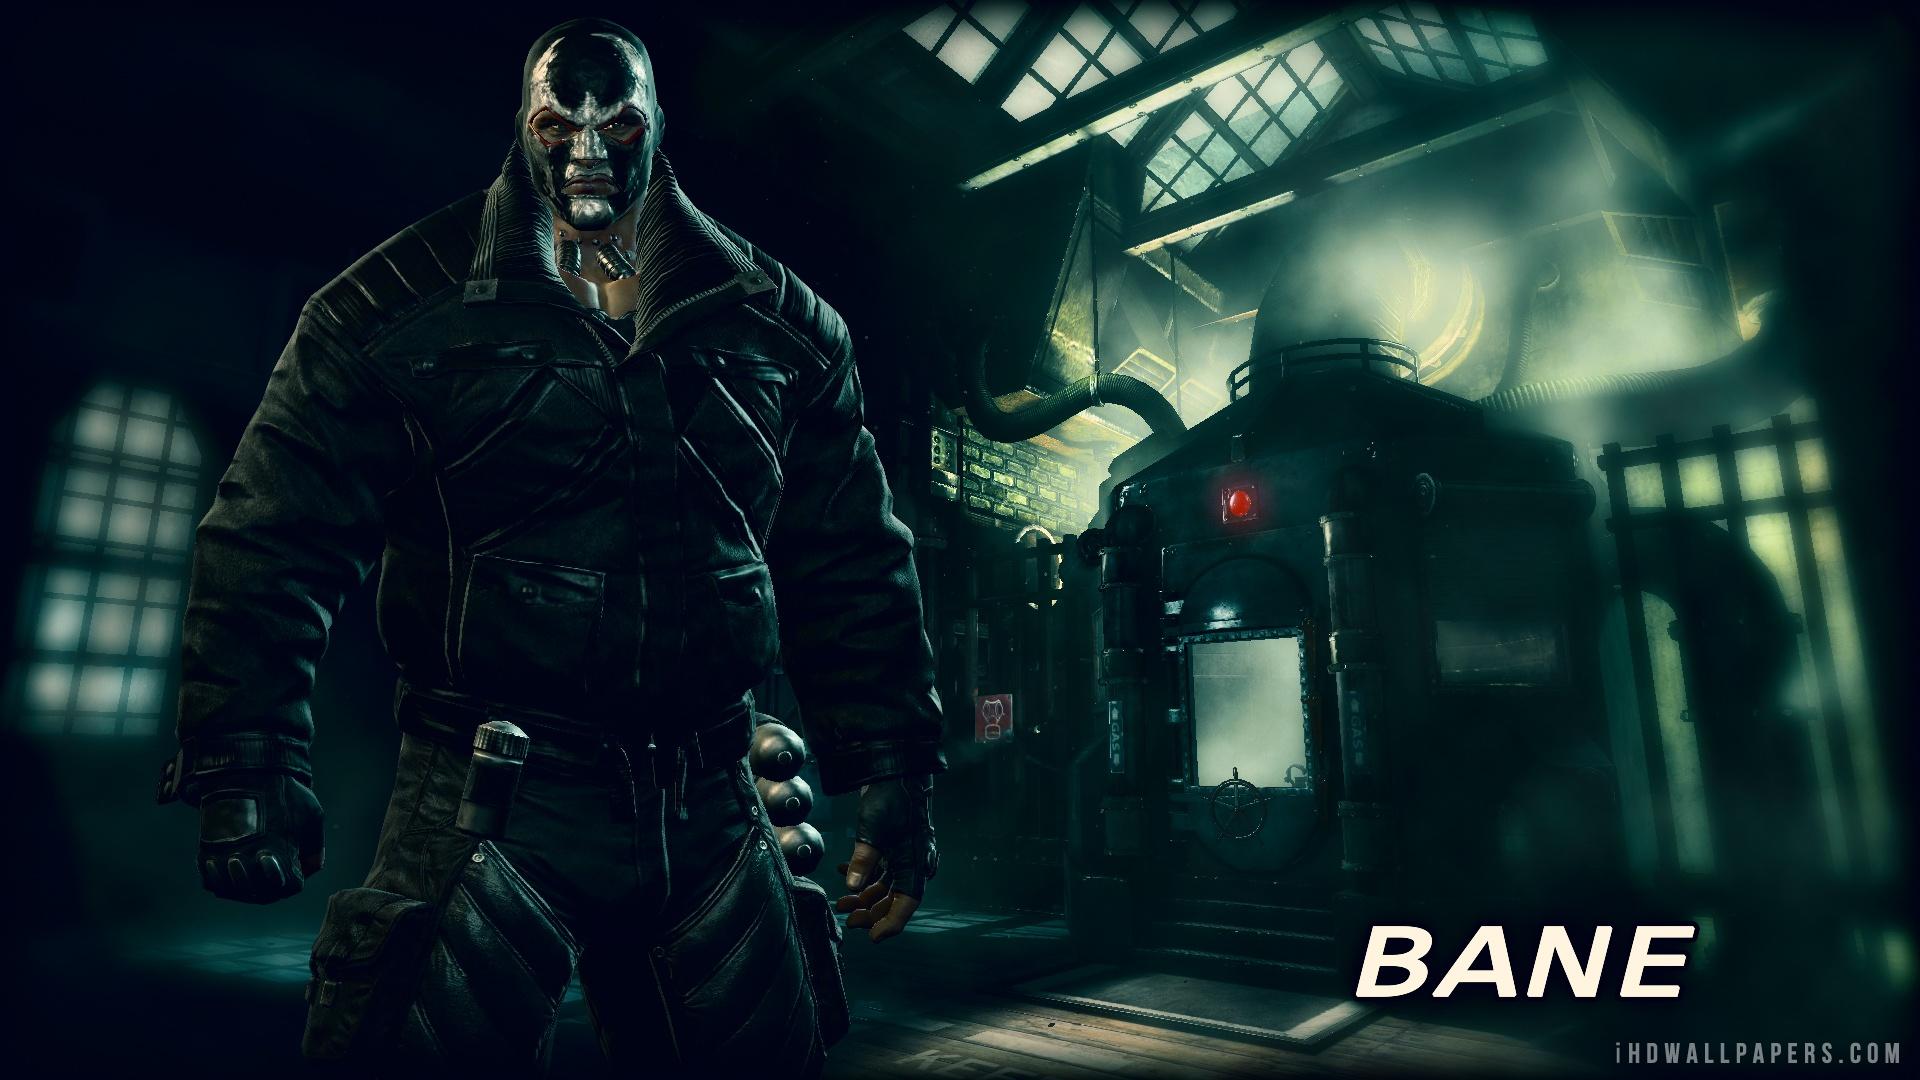 Download Bane Batman Arkham Origins wallpaper from the following 1920x1080